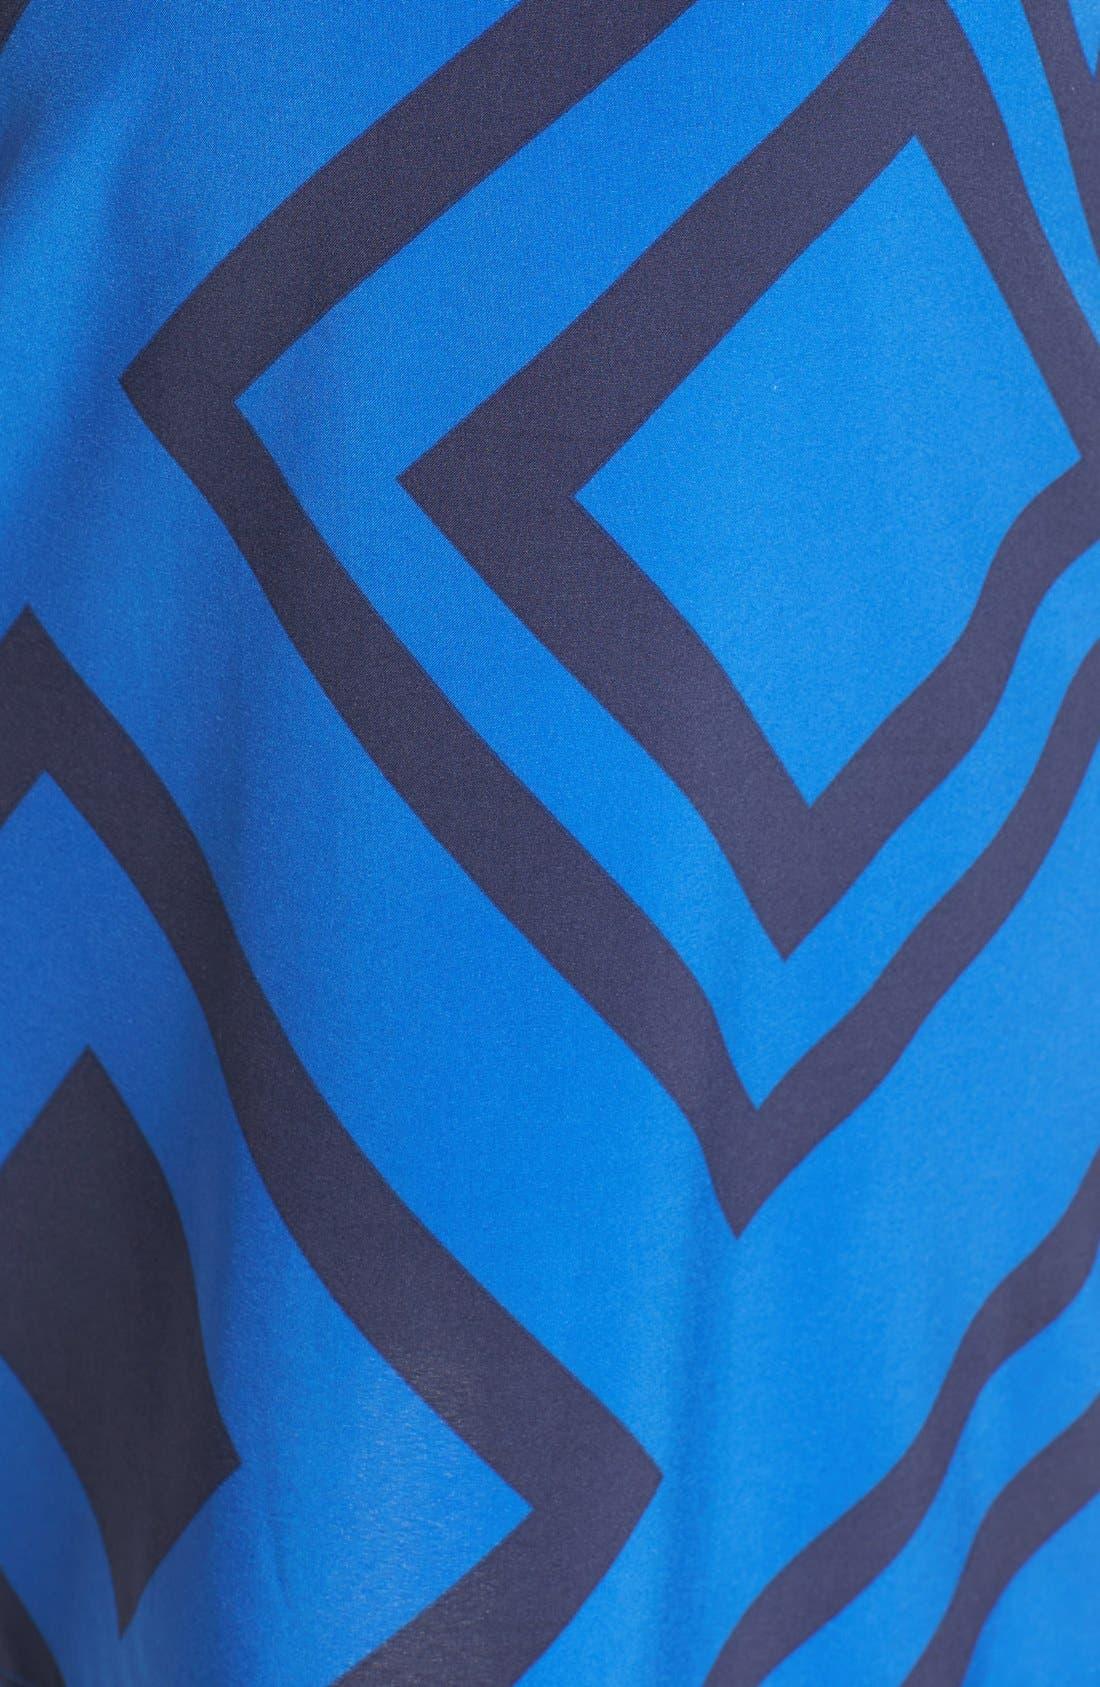 'Erin' Print Maternity/Nursing Shirtdress,                             Alternate thumbnail 5, color,                             BLUE DIAMOND